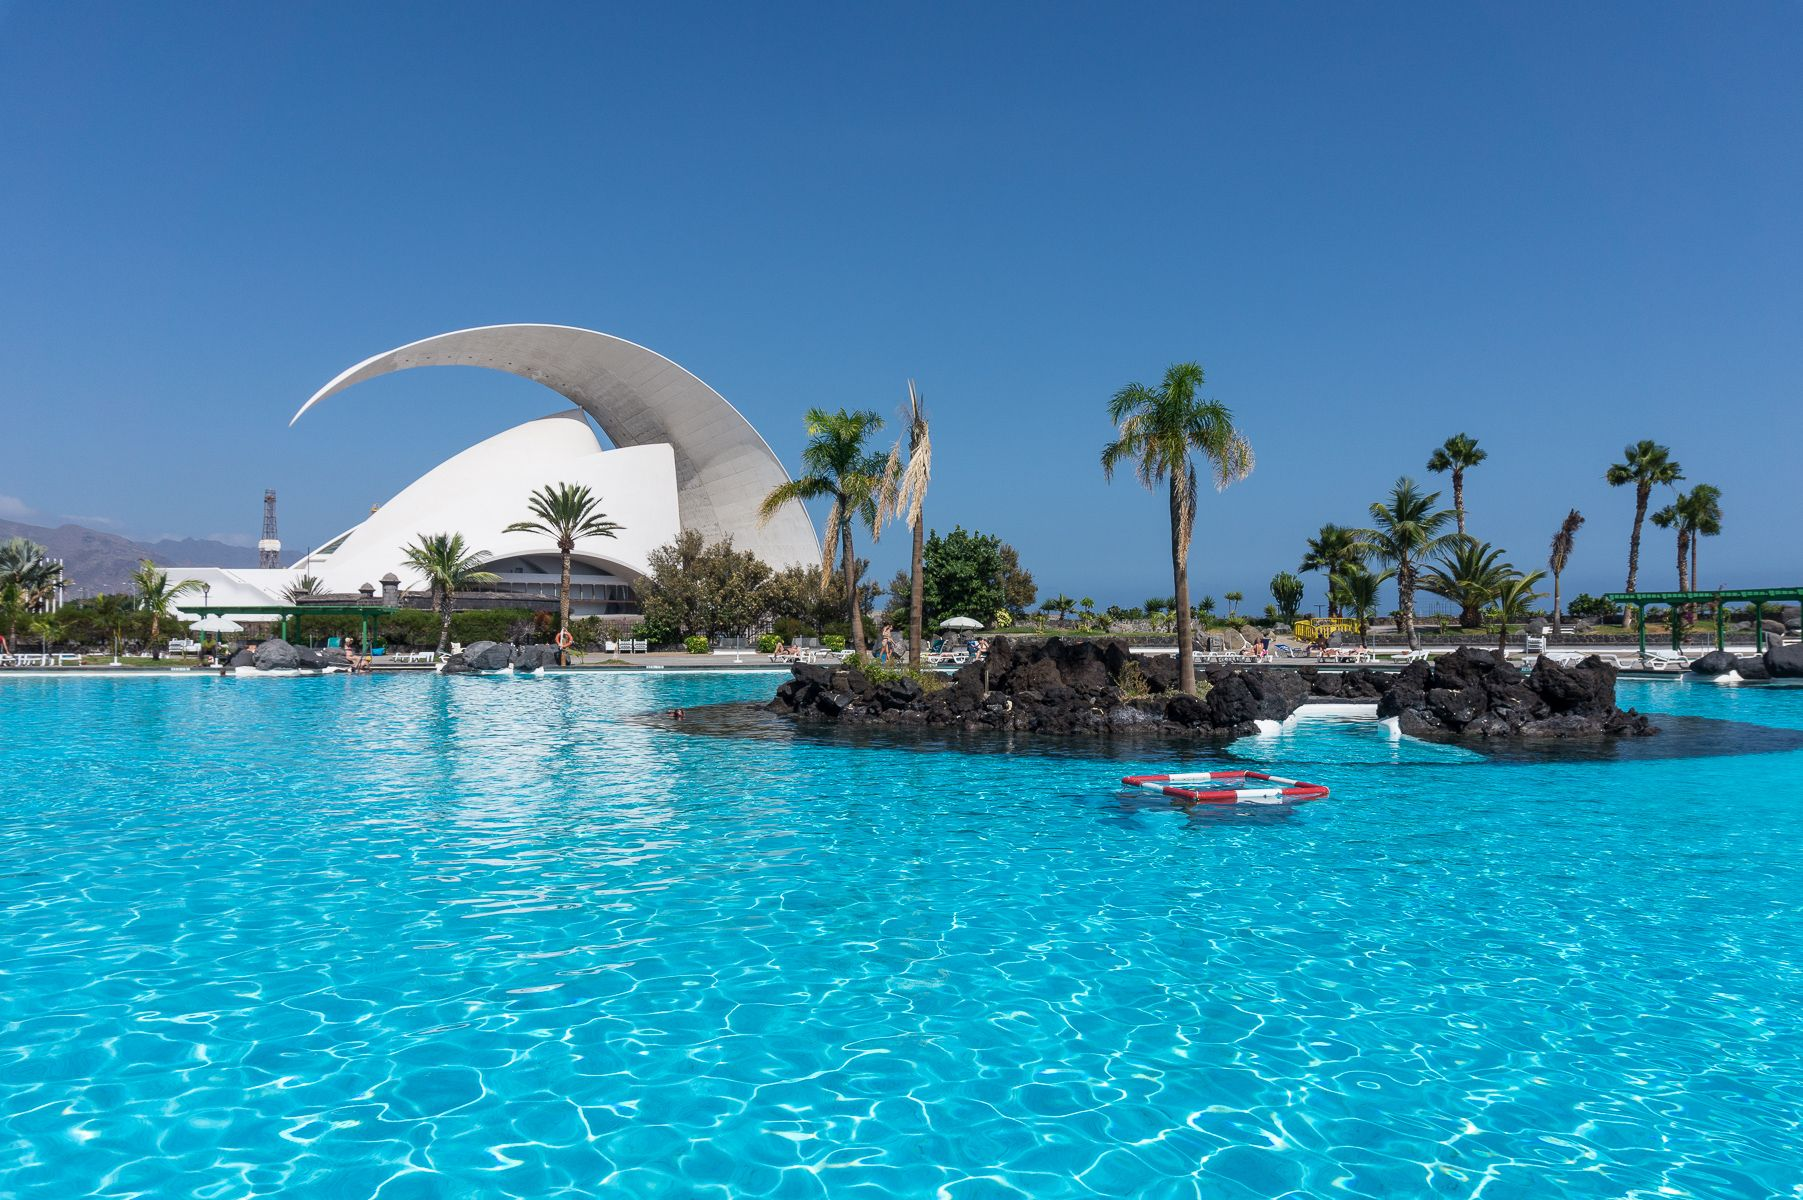 Parque Maritimo Cesar Manrique Santa Cruz De Tenerife Honeymoon Inspiration Tenerife Canary Islands